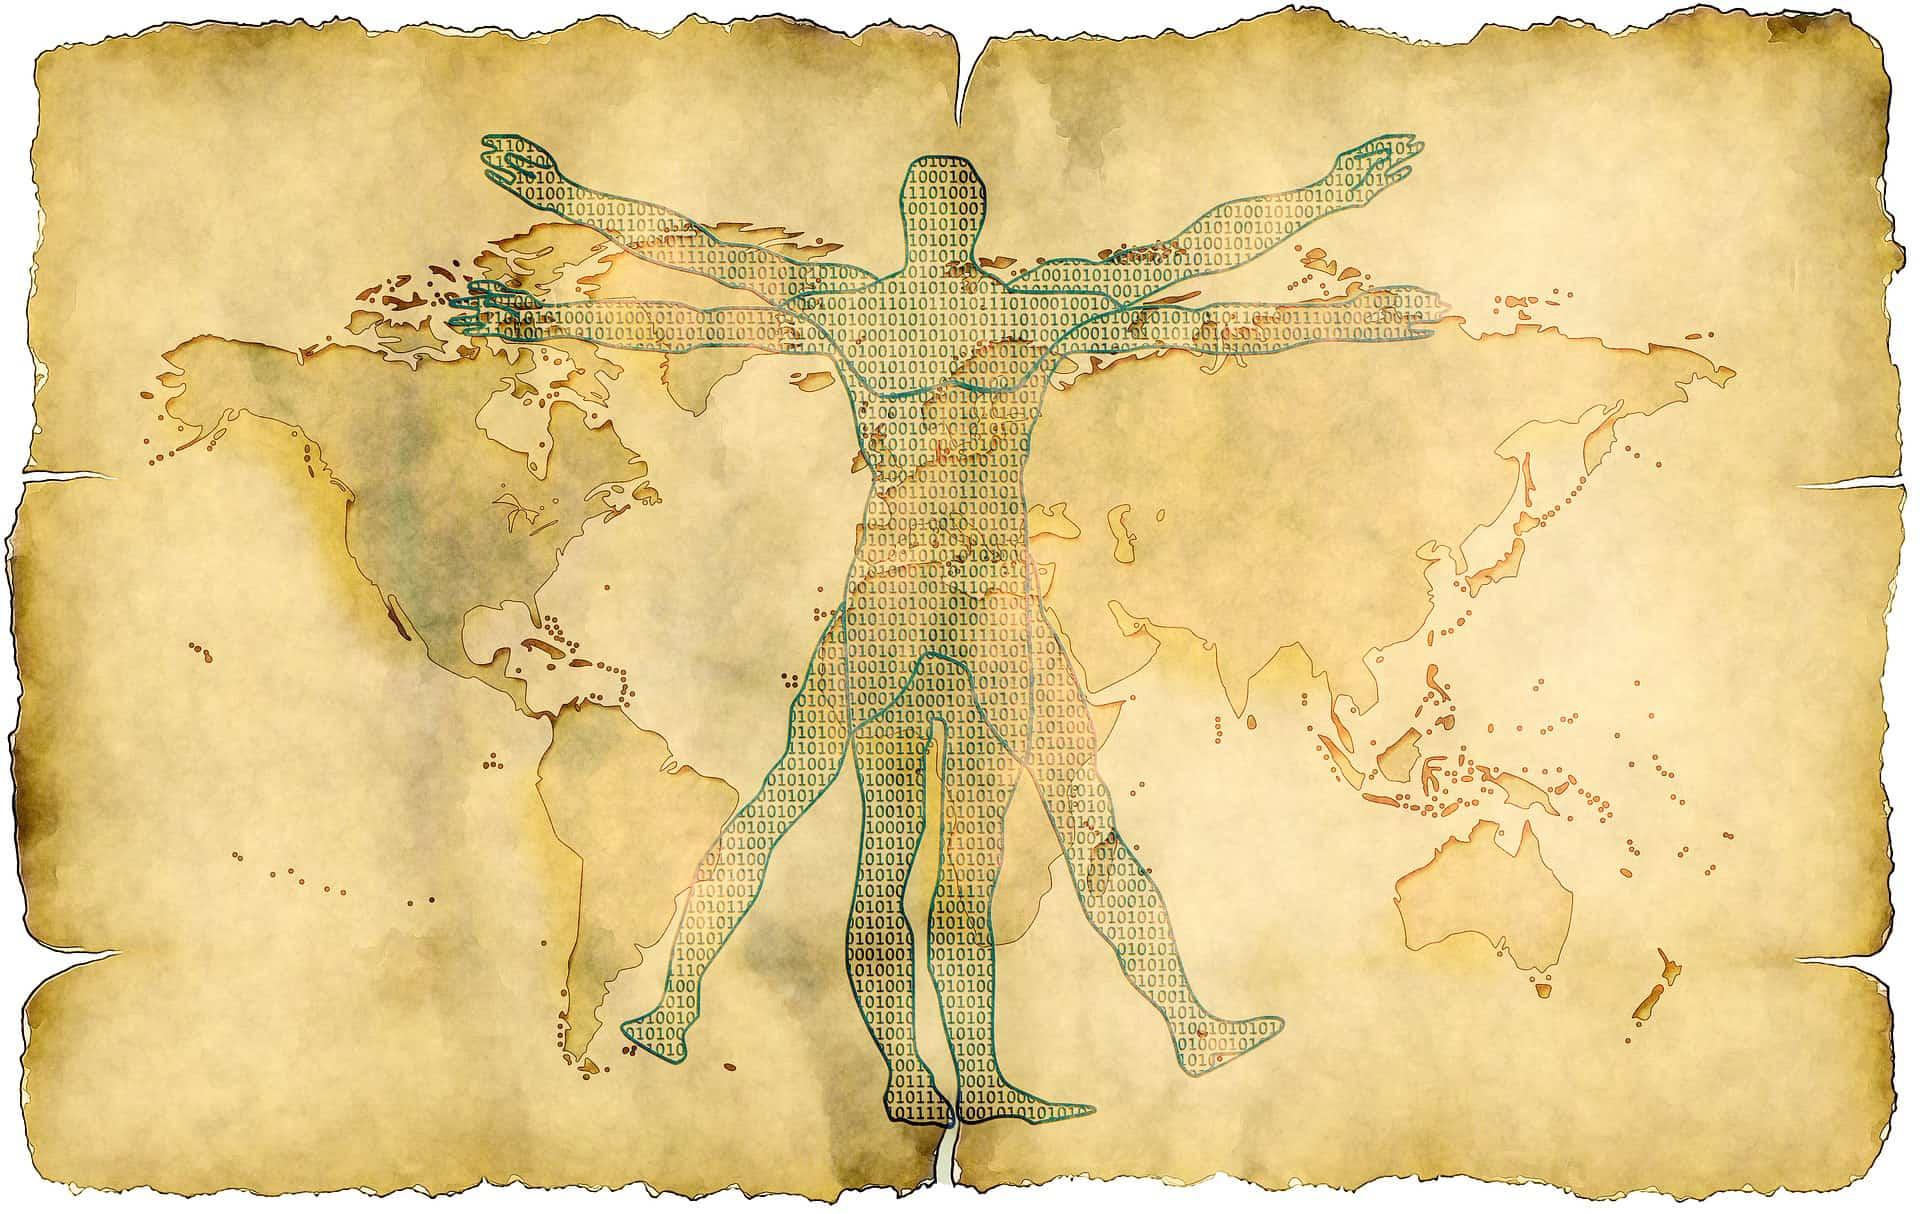 rysunek w stylu da Vinci na pergaminie